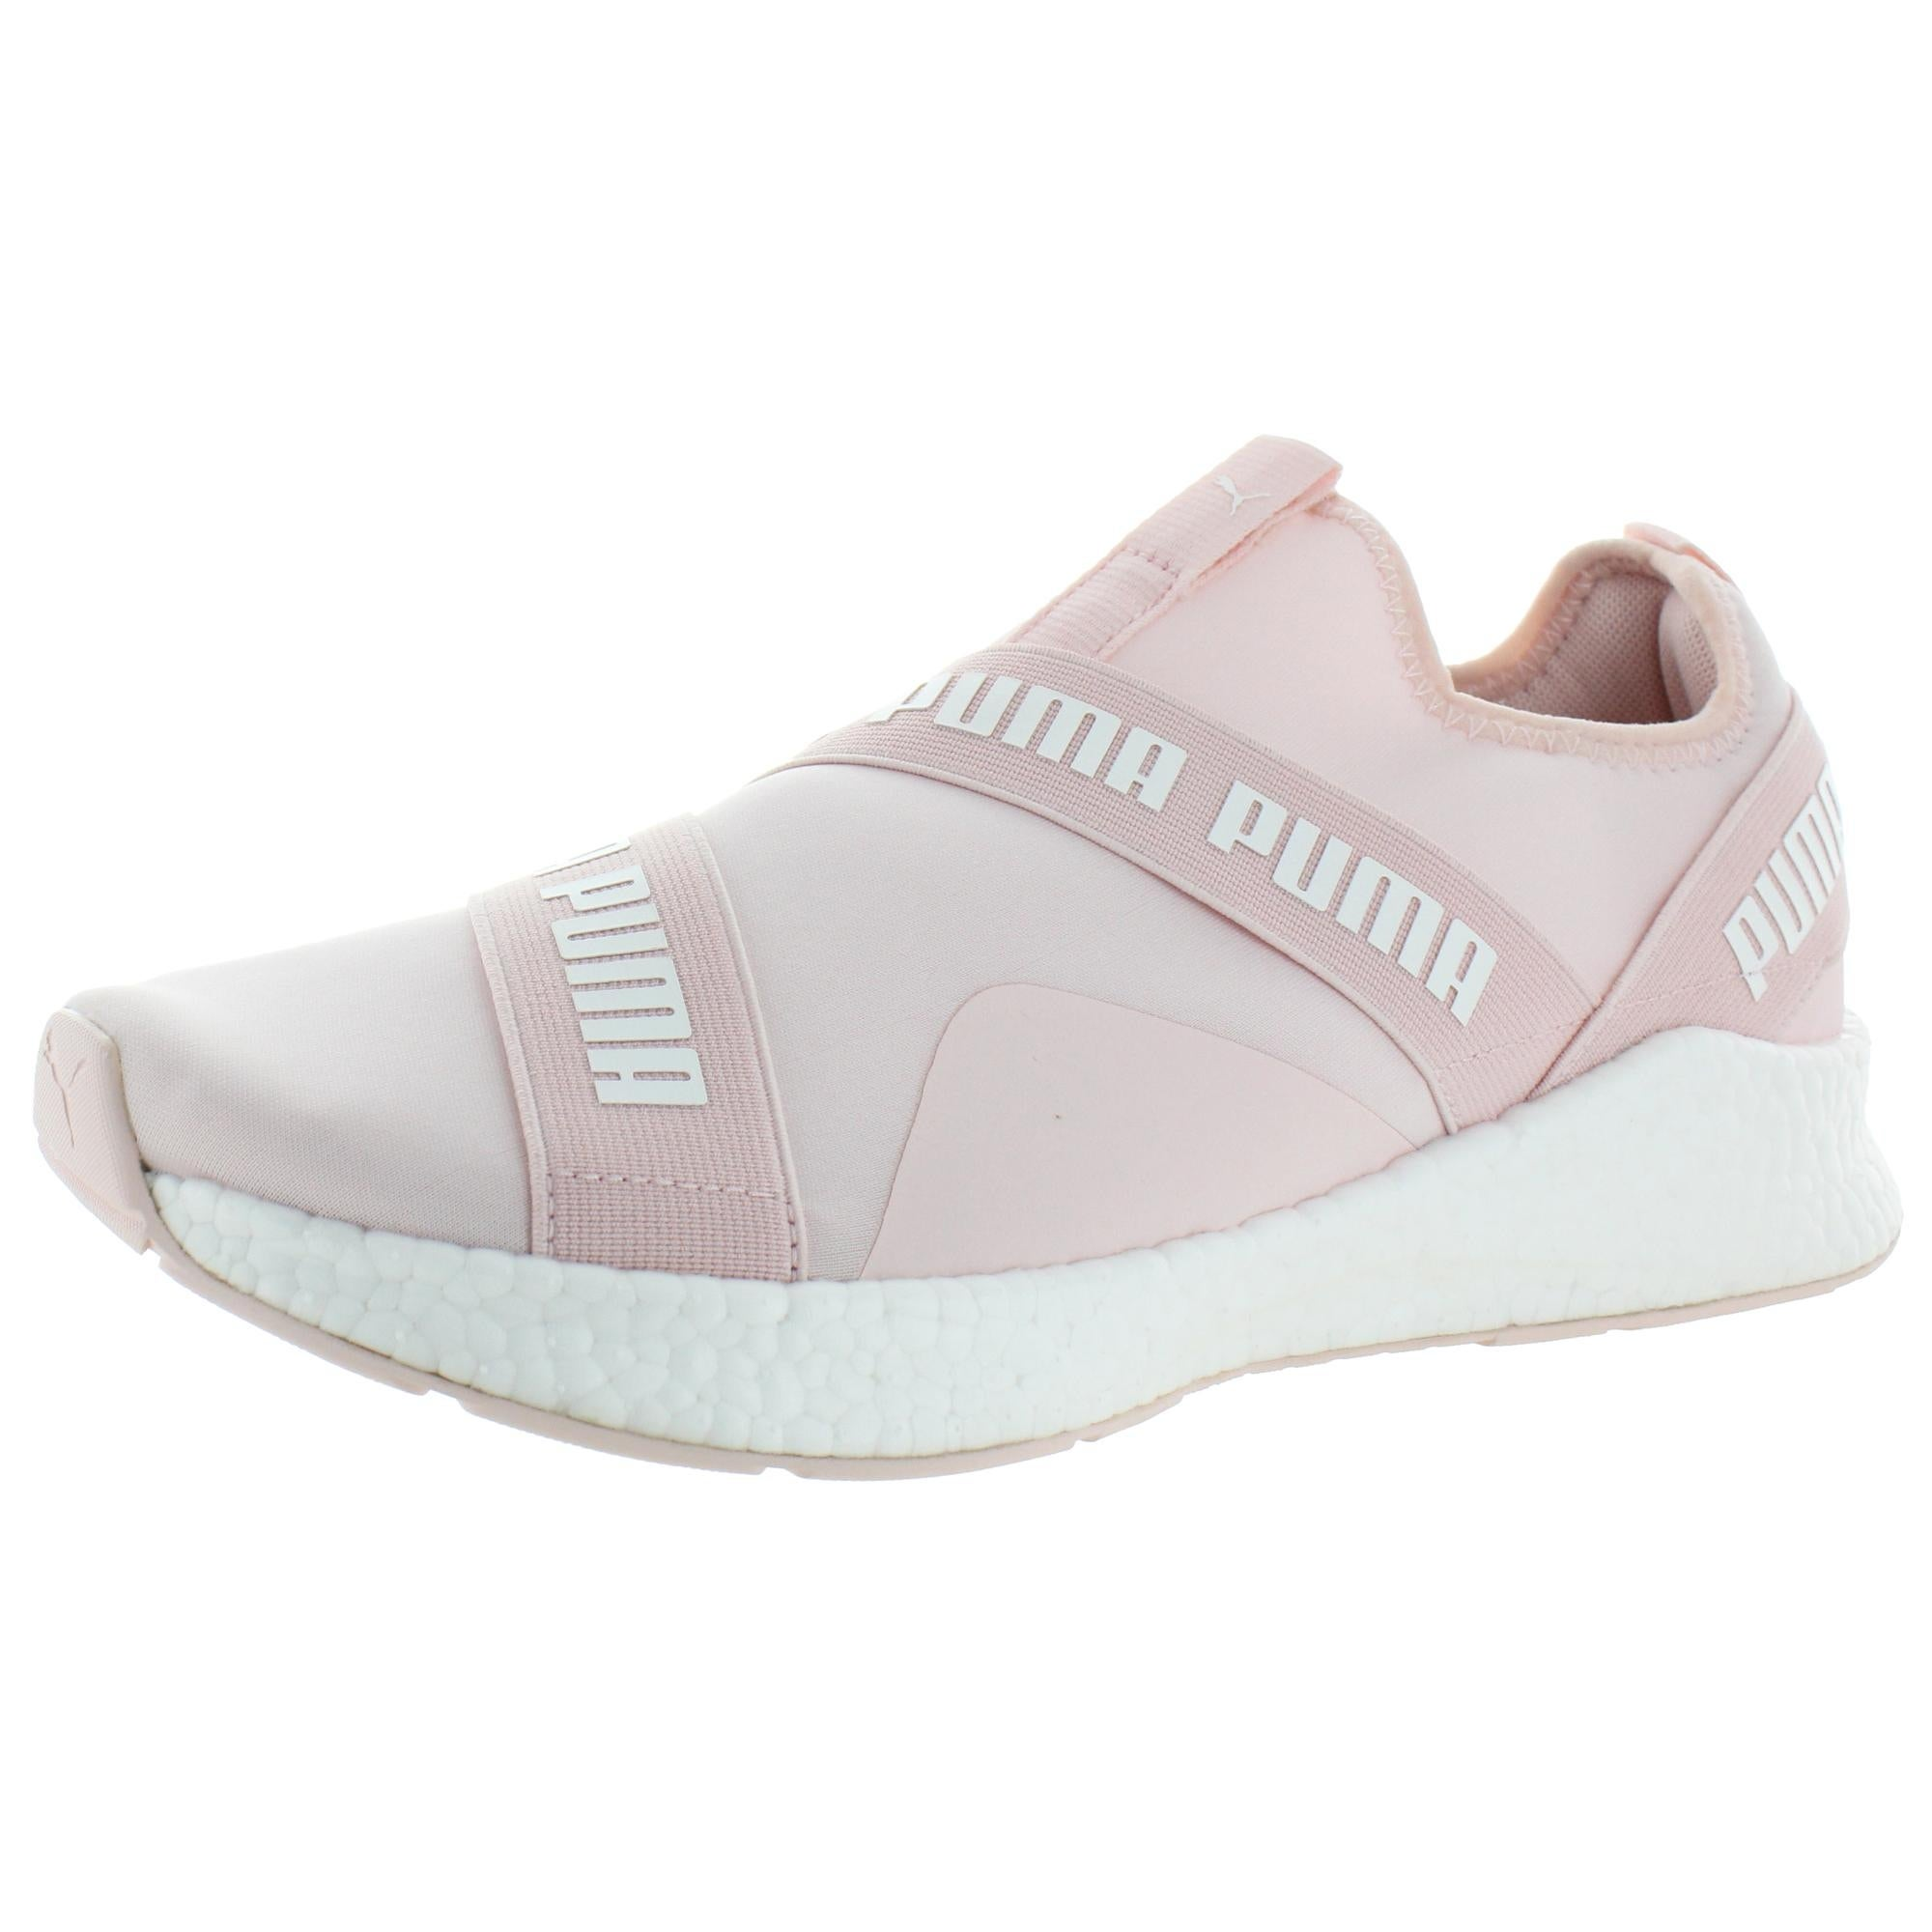 Puma Mens NRGY star Running Shoes Slip